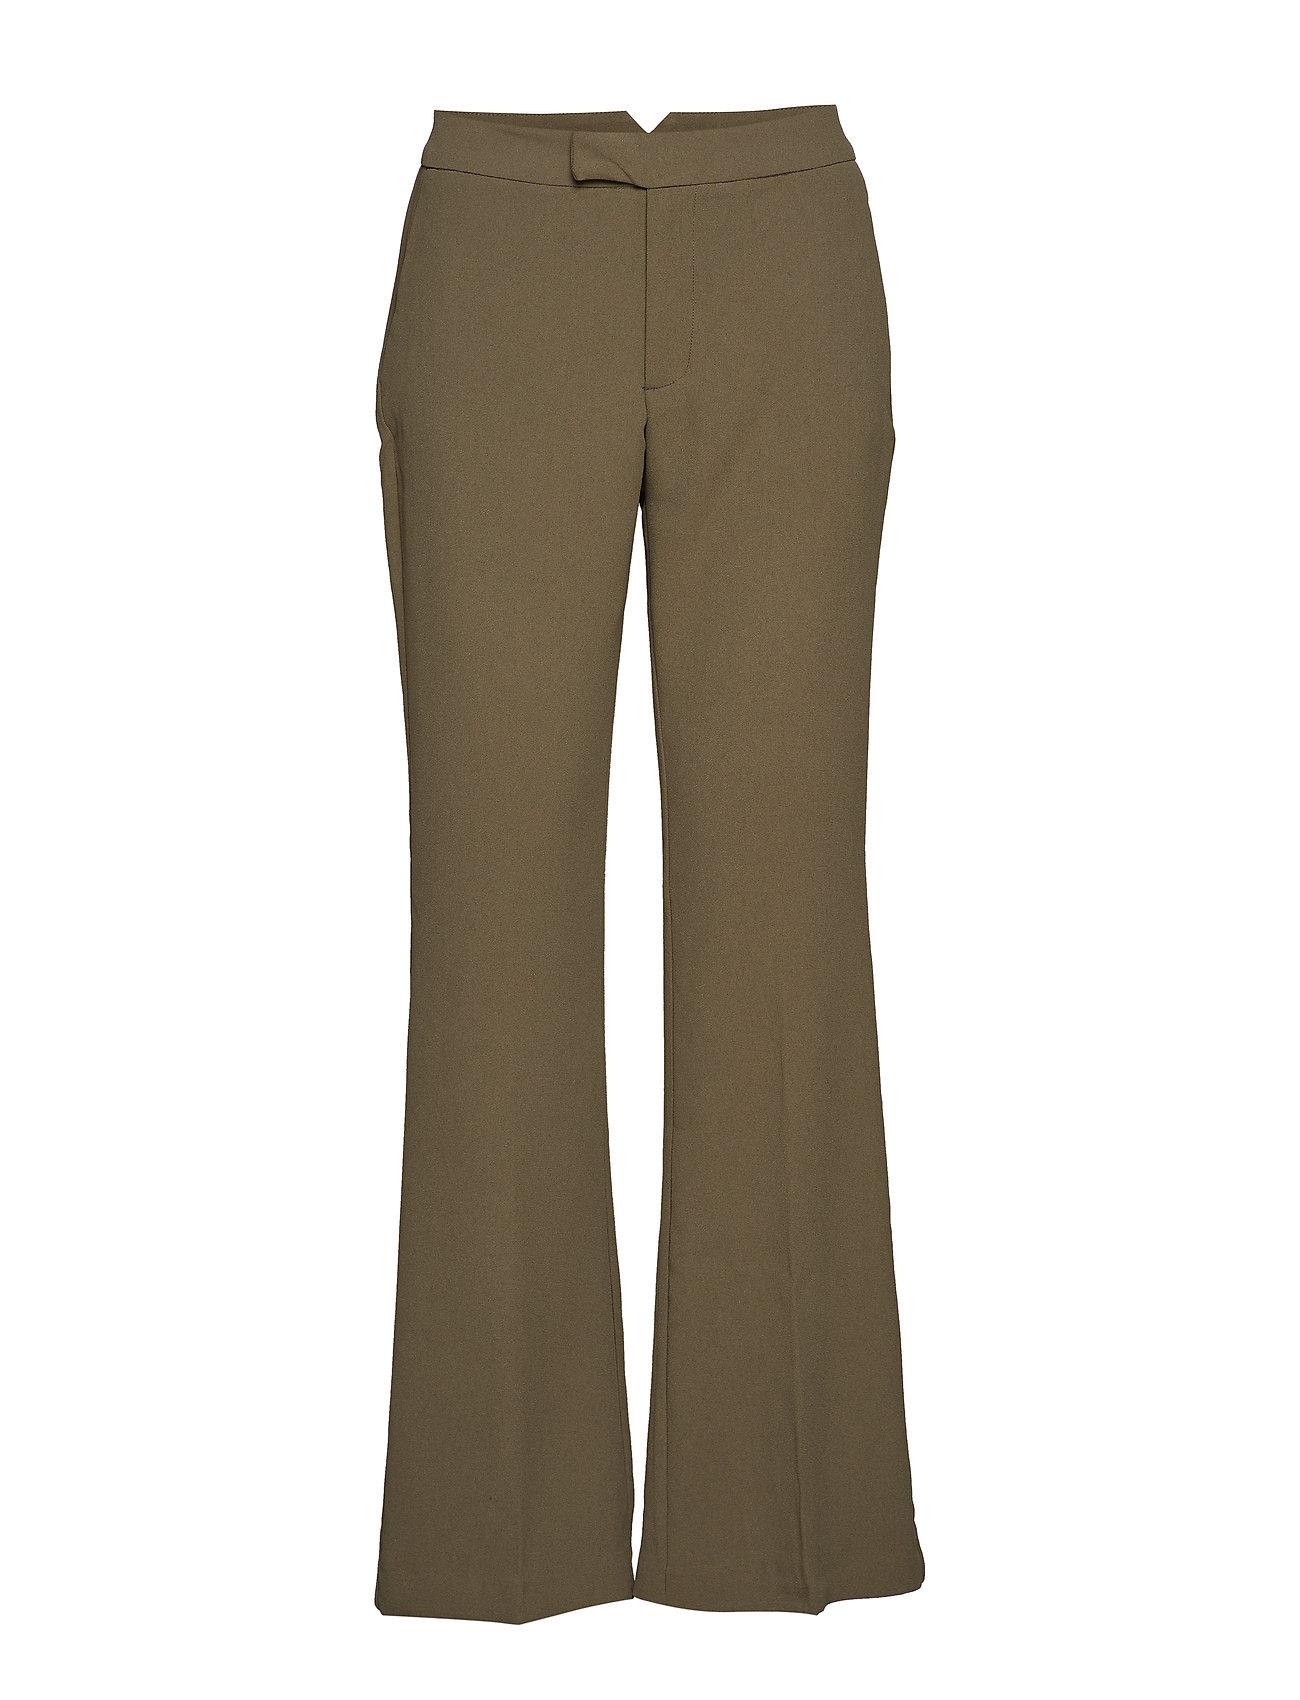 2b95b080 Onlfleur Suit Pant (Kalamata) (239.40 kr) - ONLY -   Boozt.com